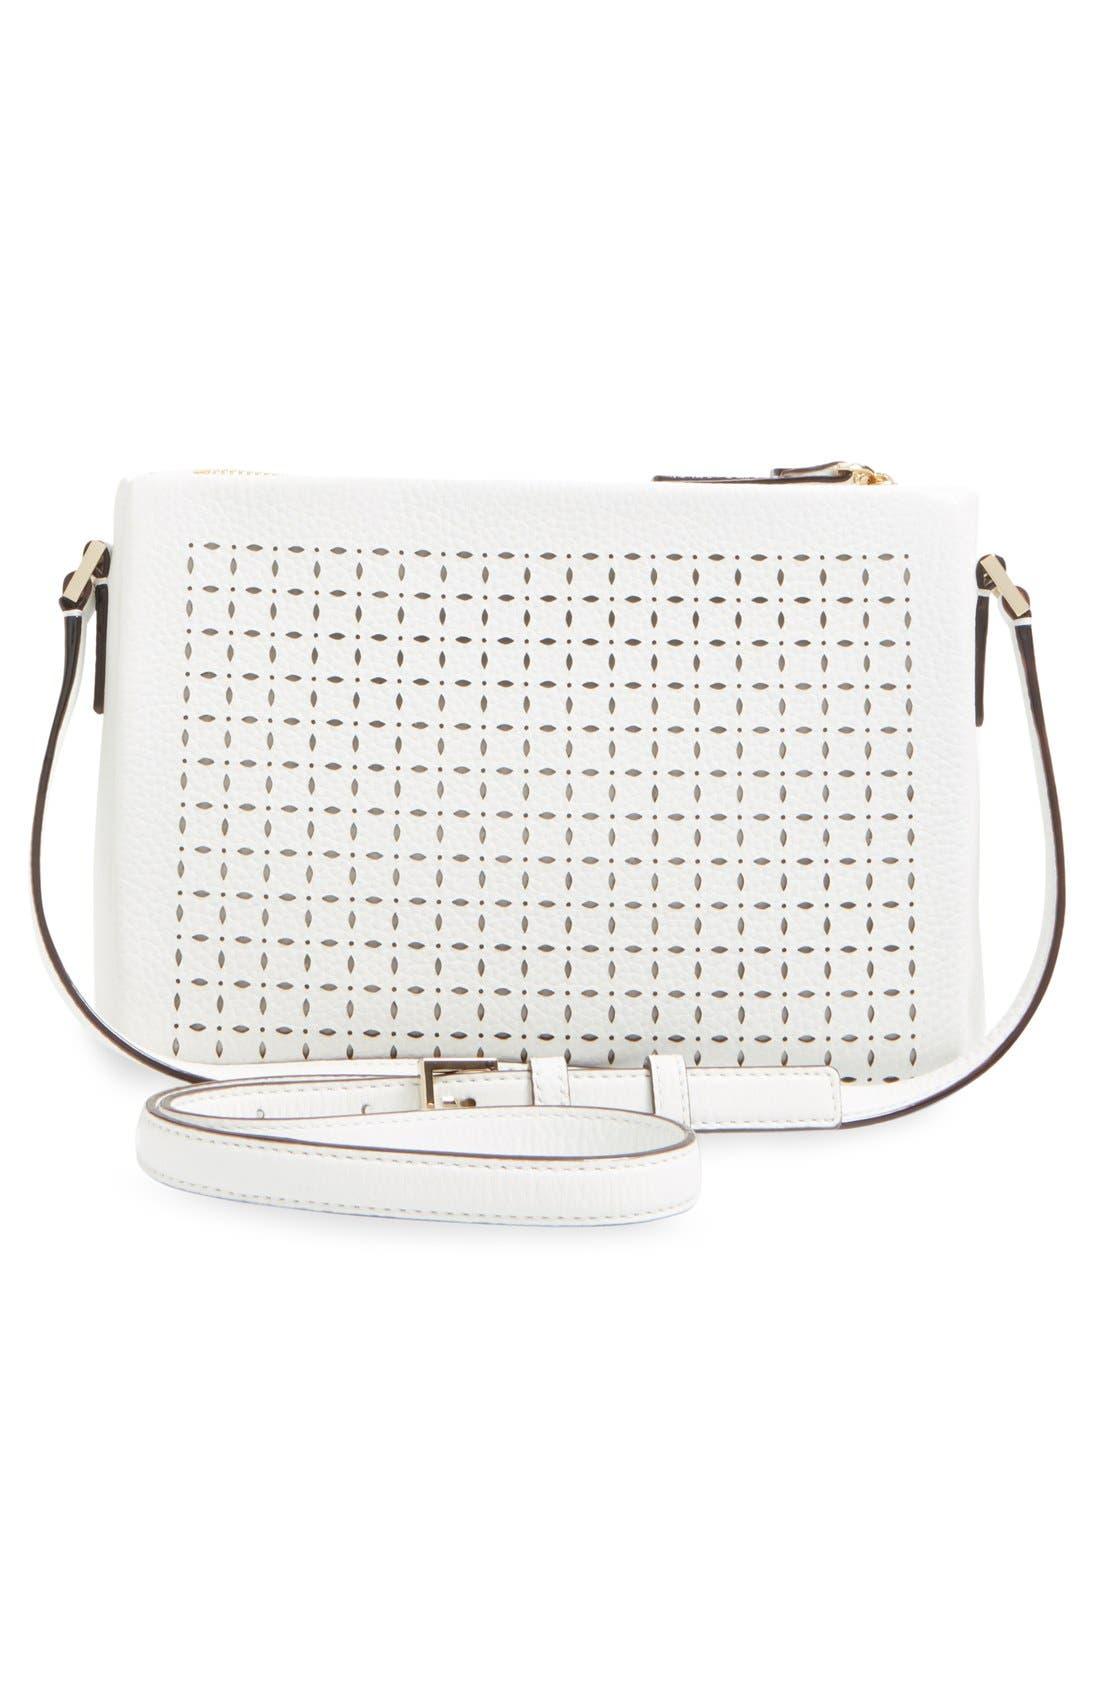 KATE SPADE NEW YORK, 'milton lane - lilibeth' perforated leather crossbody bag, Alternate thumbnail 2, color, 100